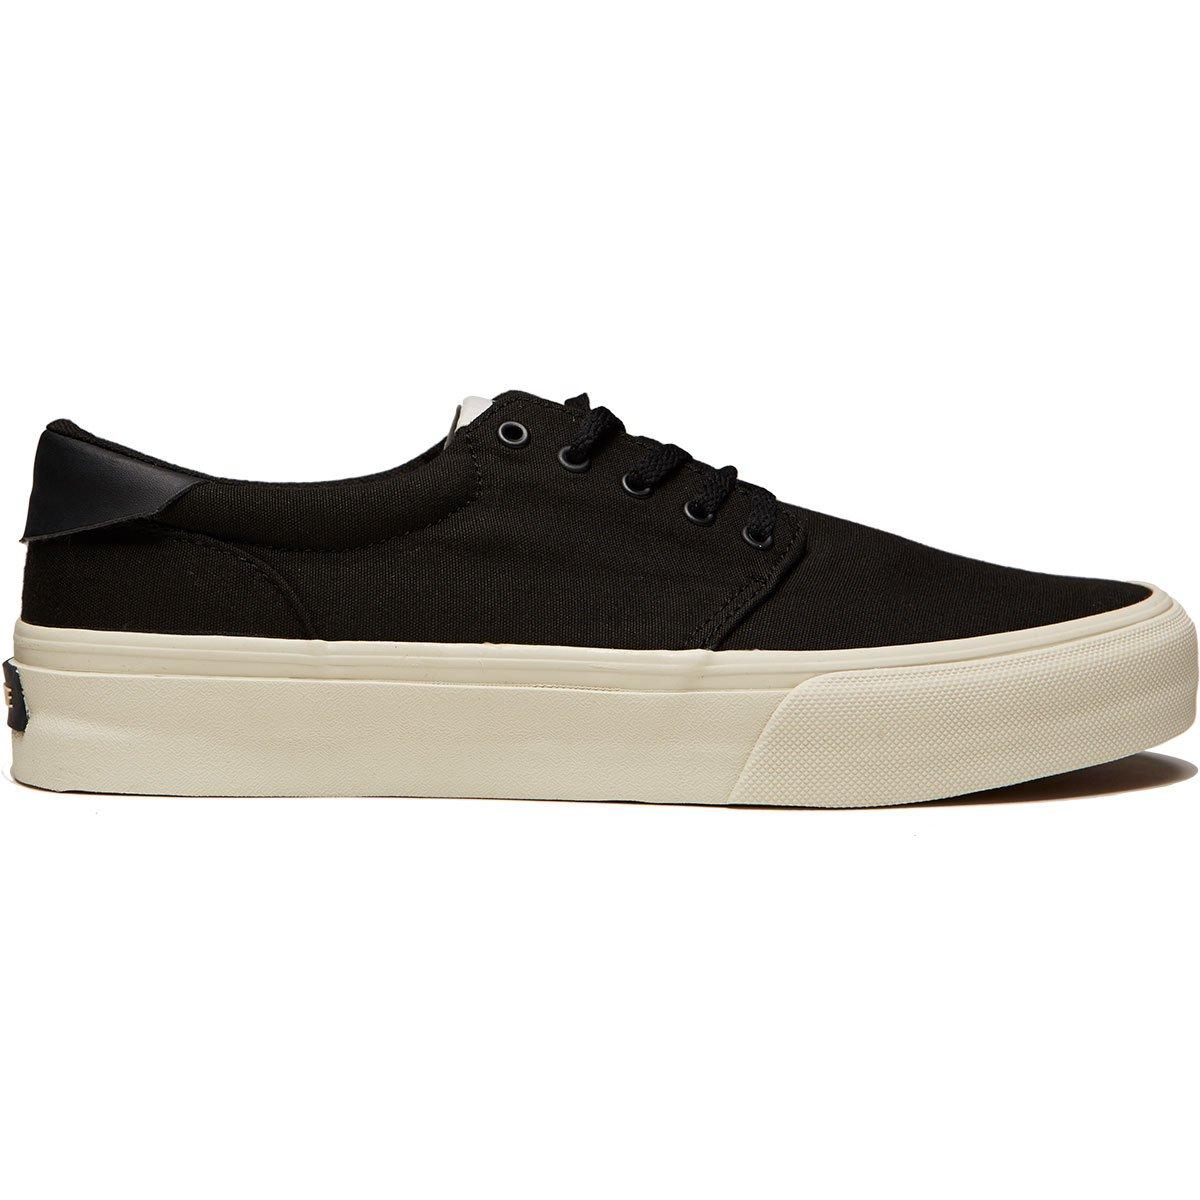 Straye Fairfax Shoes - Black Bone - 9.5  Amazon.ca  Clothing   Accessories 5df4102b4cb